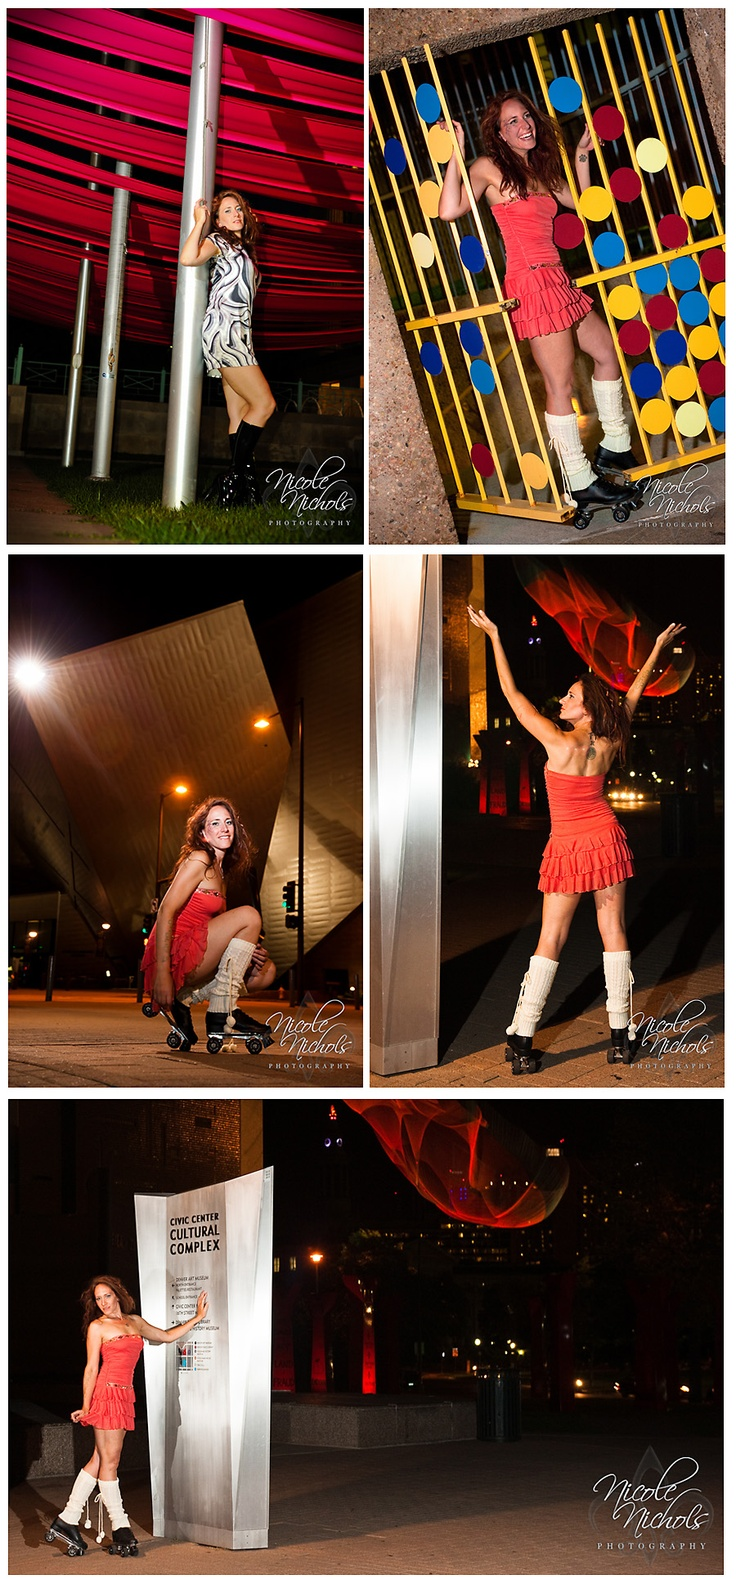 Roller skating denver - 1980s Inspired Roller Skate Portrait Shoot In Downtown Denver By Nichole Nichols Photography